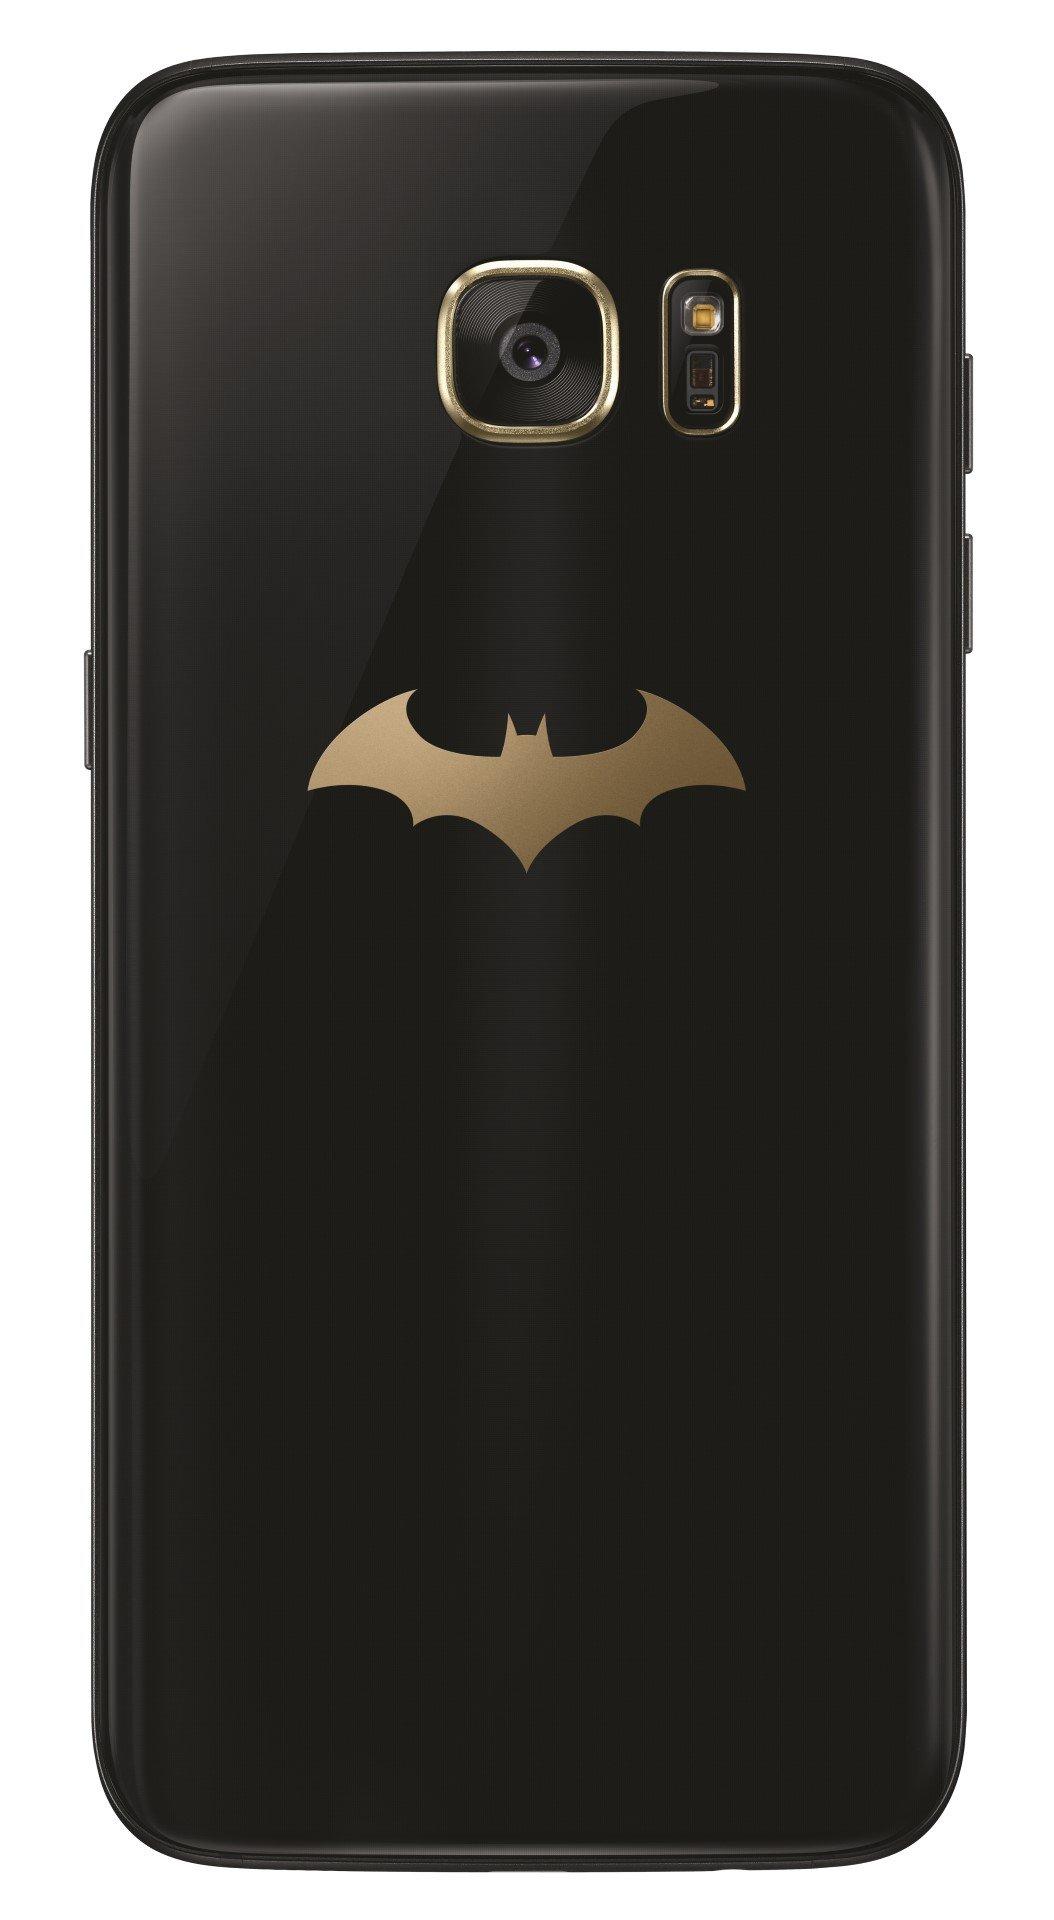 Samsung Galaxy S7 Edge - Batman Edition soll kommen 5